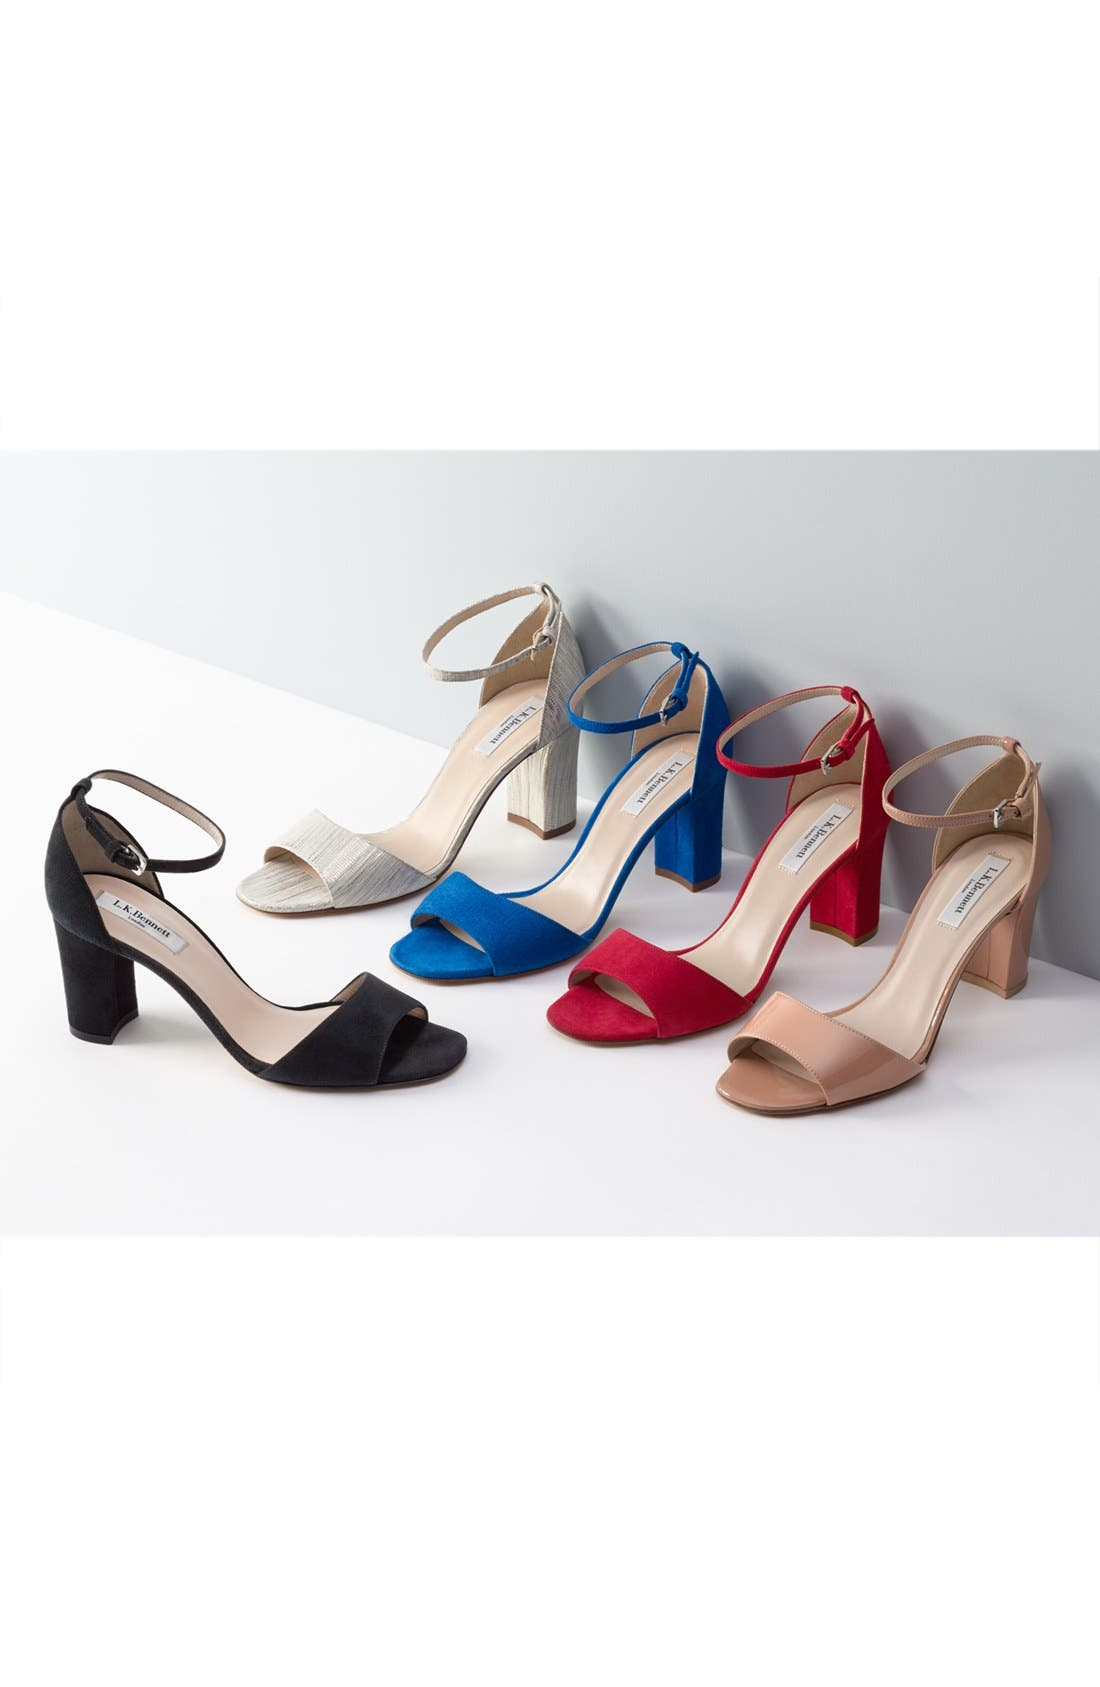 'Helena' Ankle Strap Block Heel Sandal,                             Alternate thumbnail 7, color,                             710